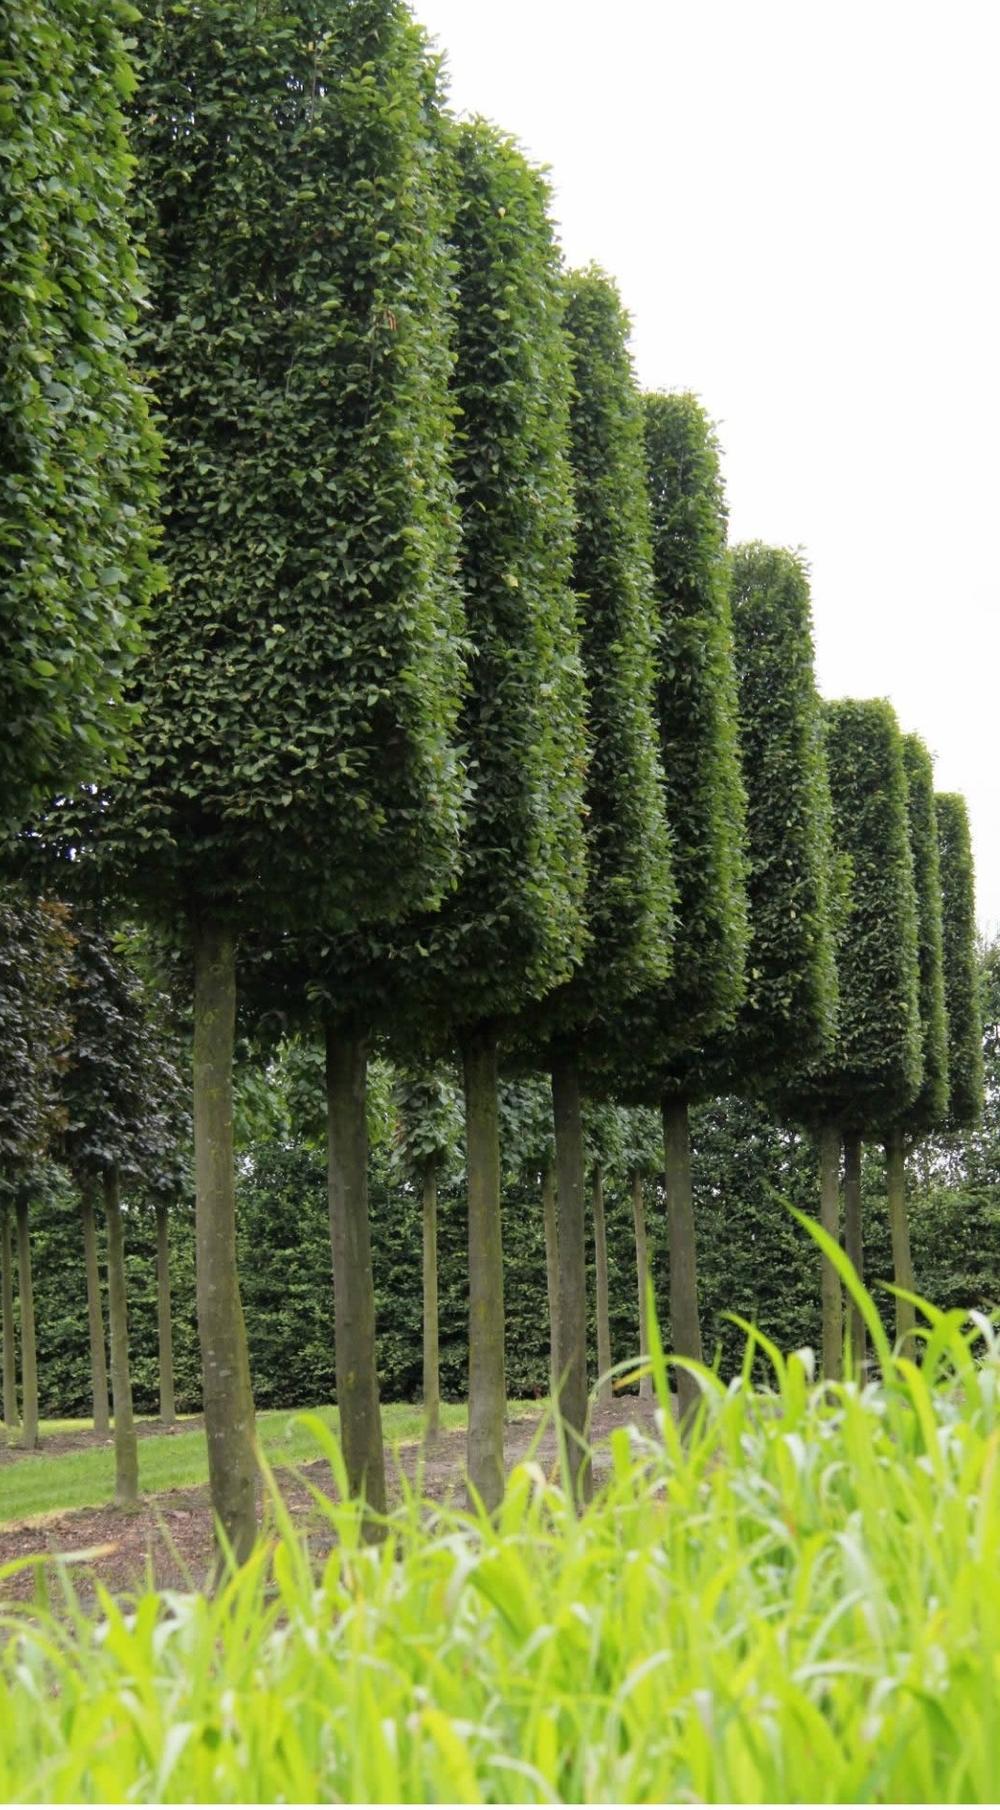 Mature Hornbeam boxhead trees